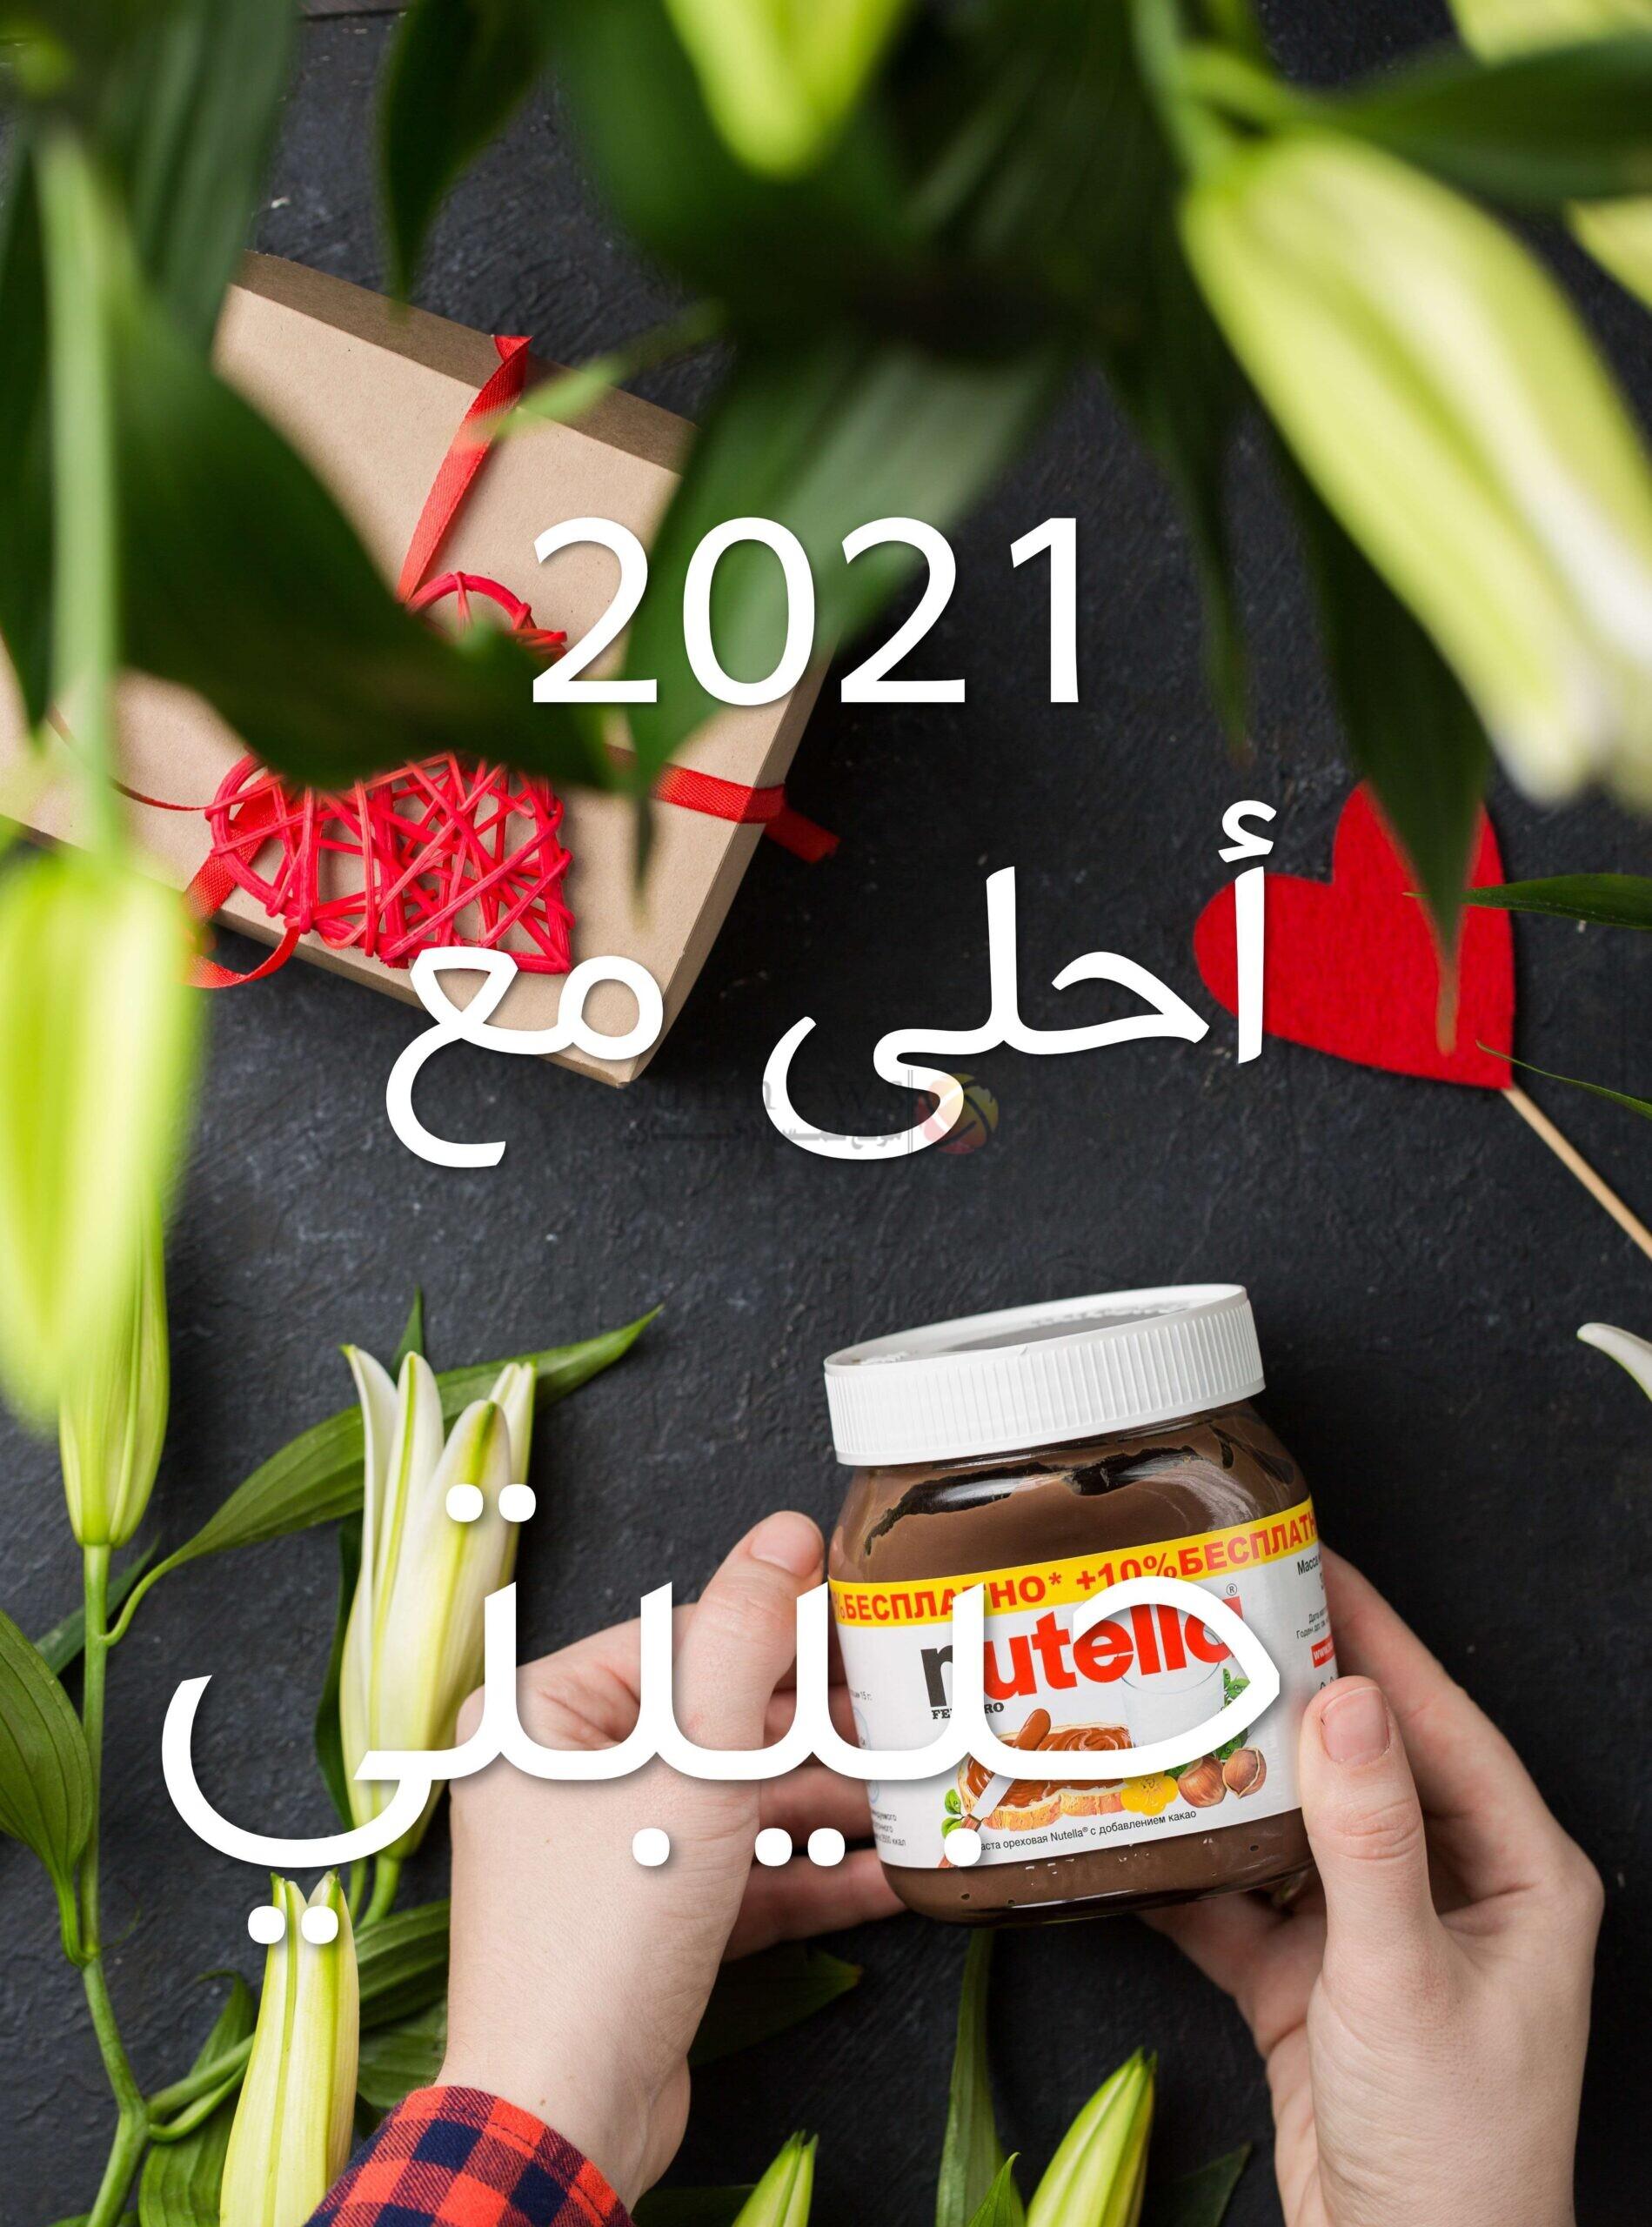 2021 أحلى مع حبيبتي (1)